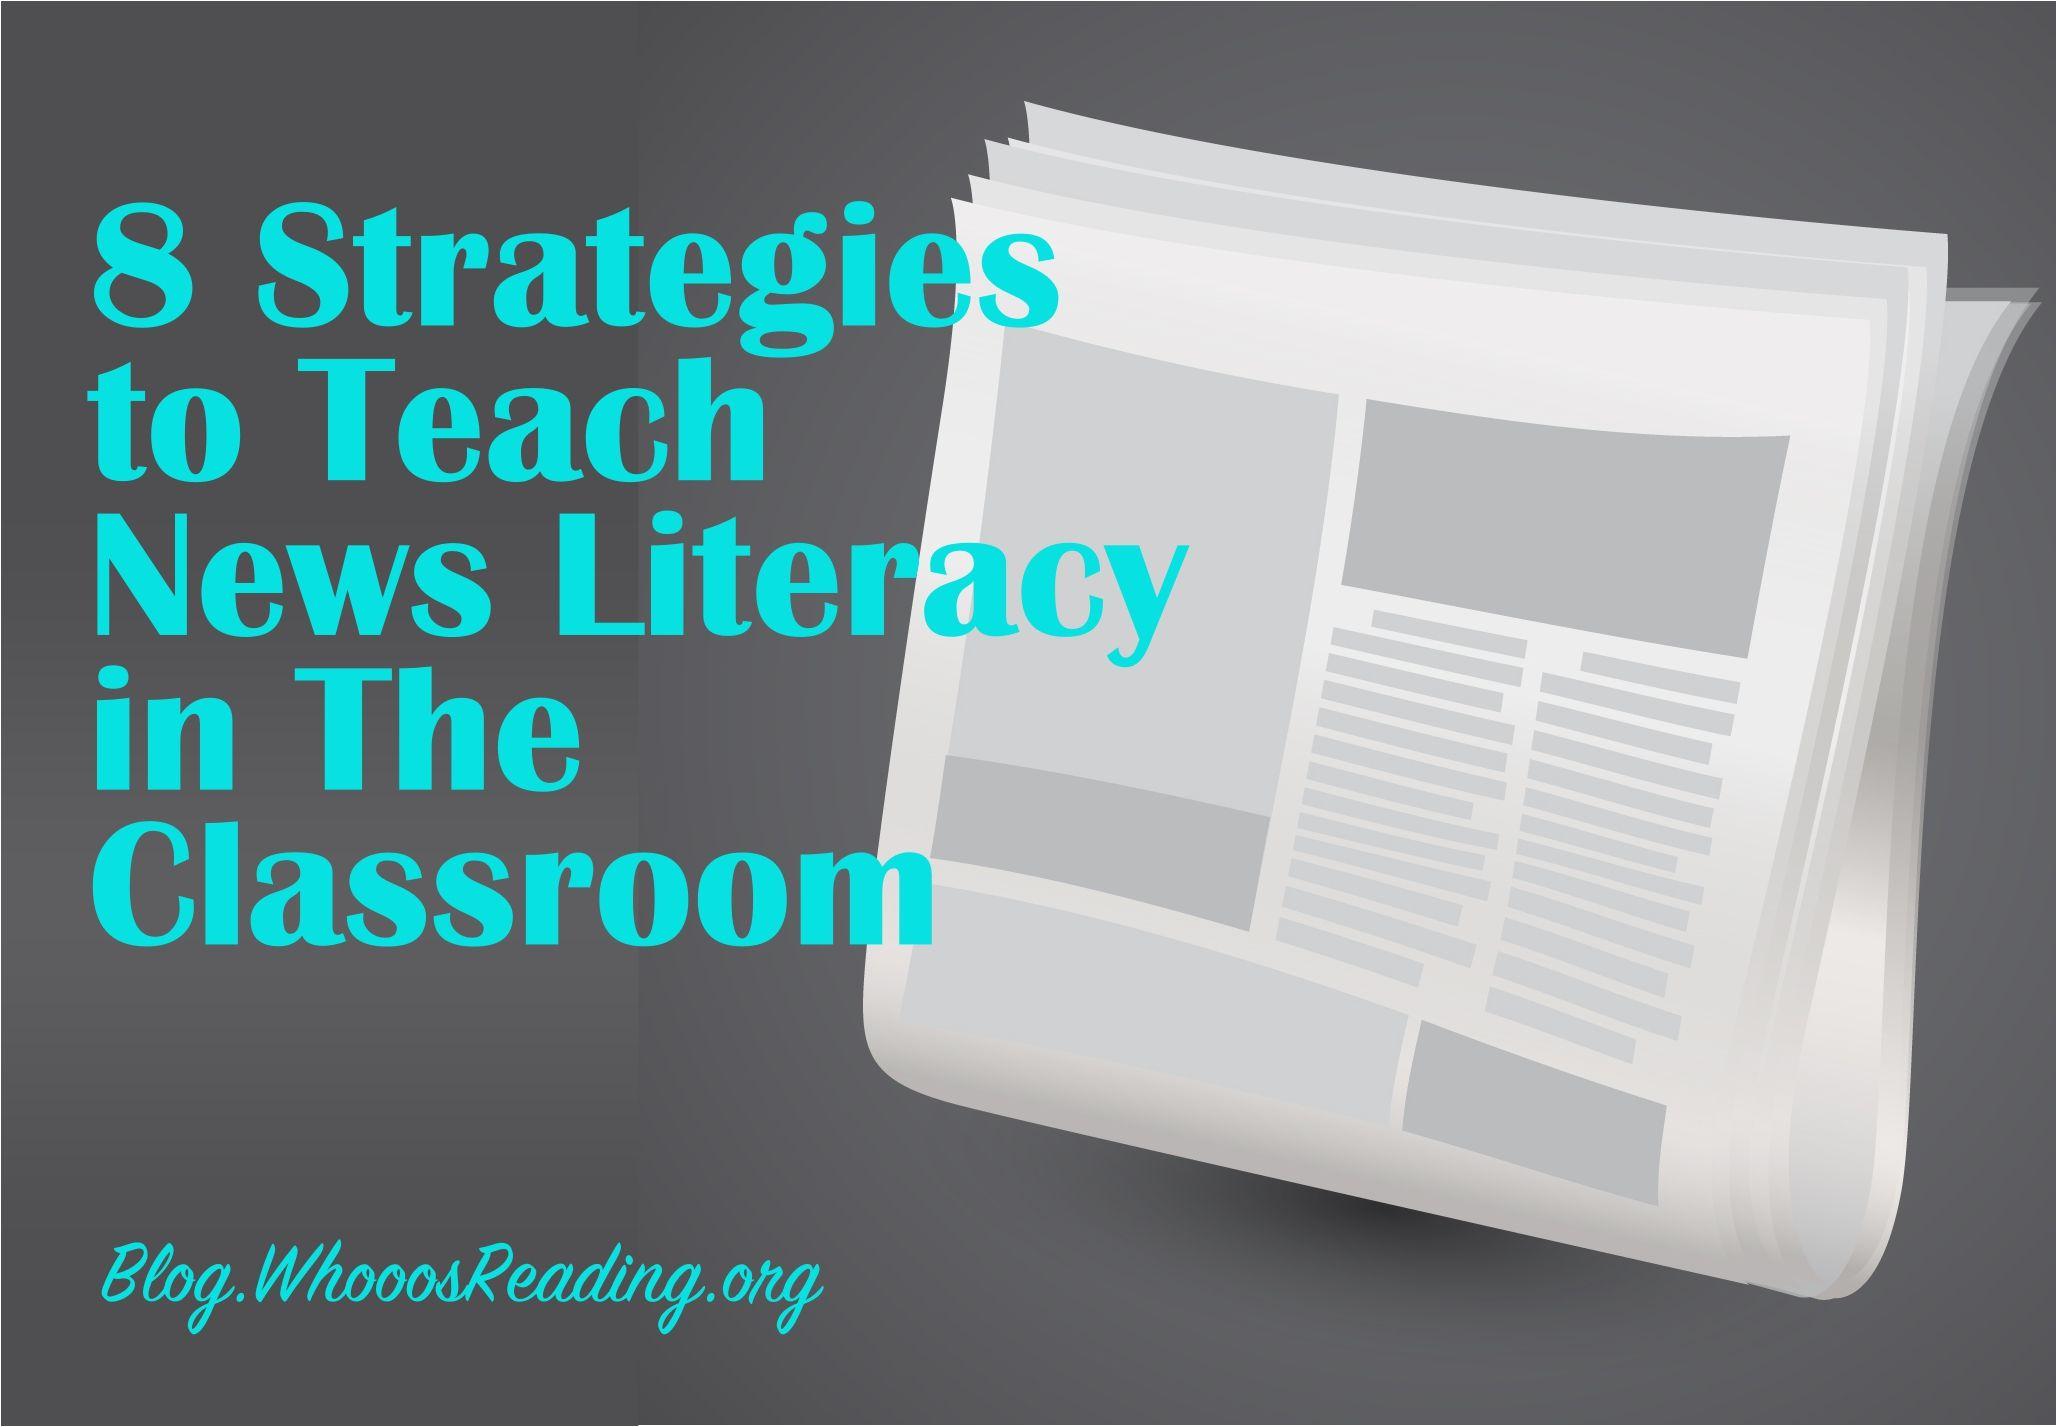 8 Strategies To Teach News Literacy